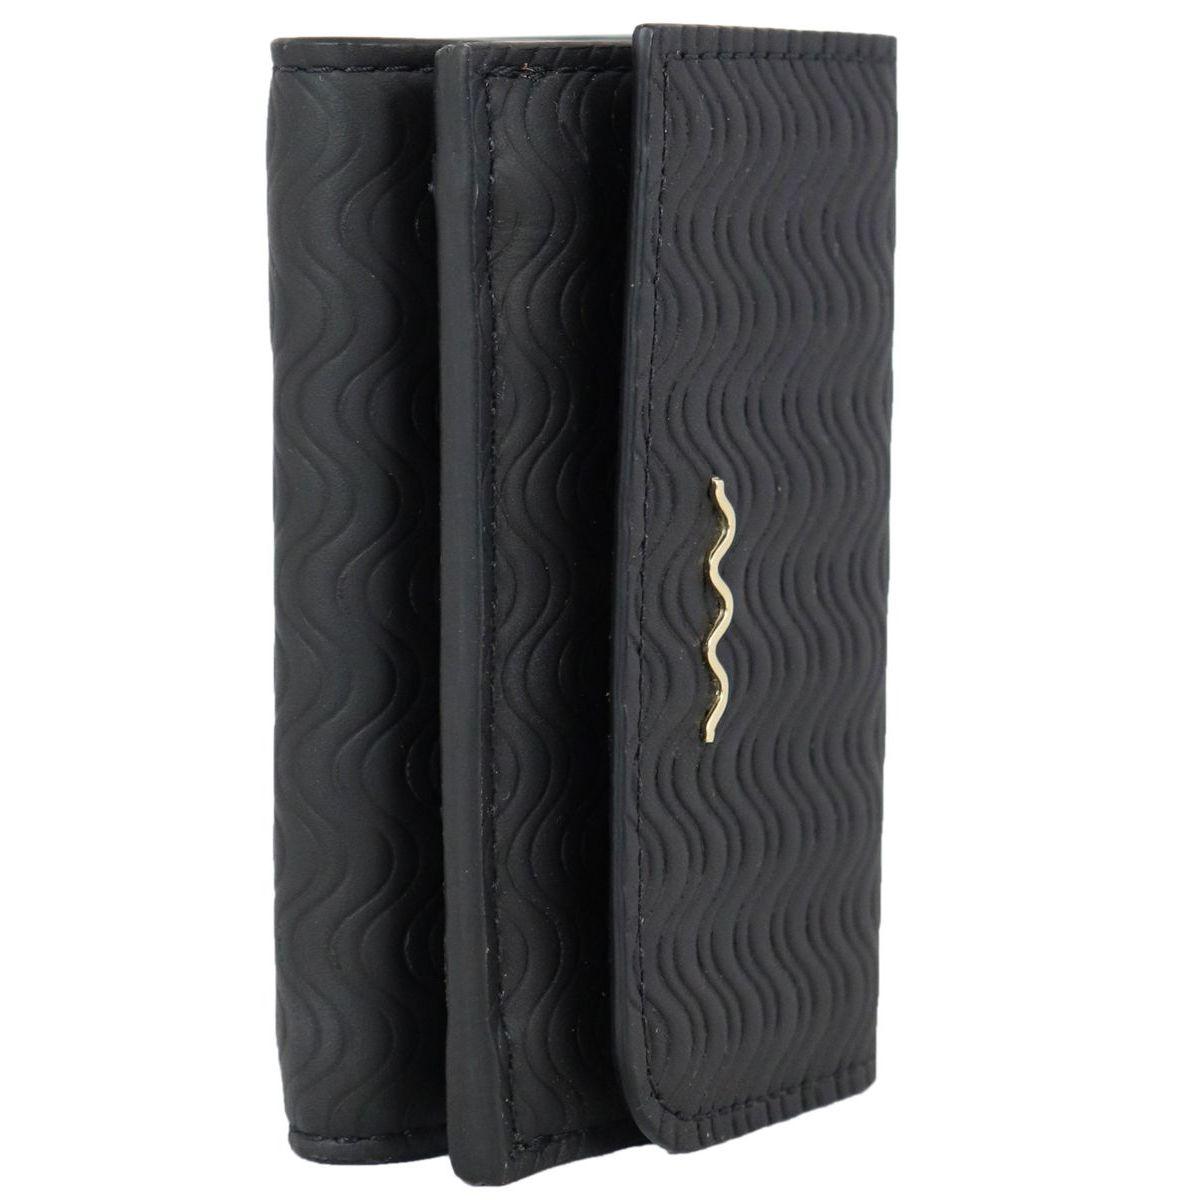 Blandine Silk Wallet in leather Black Zanellato